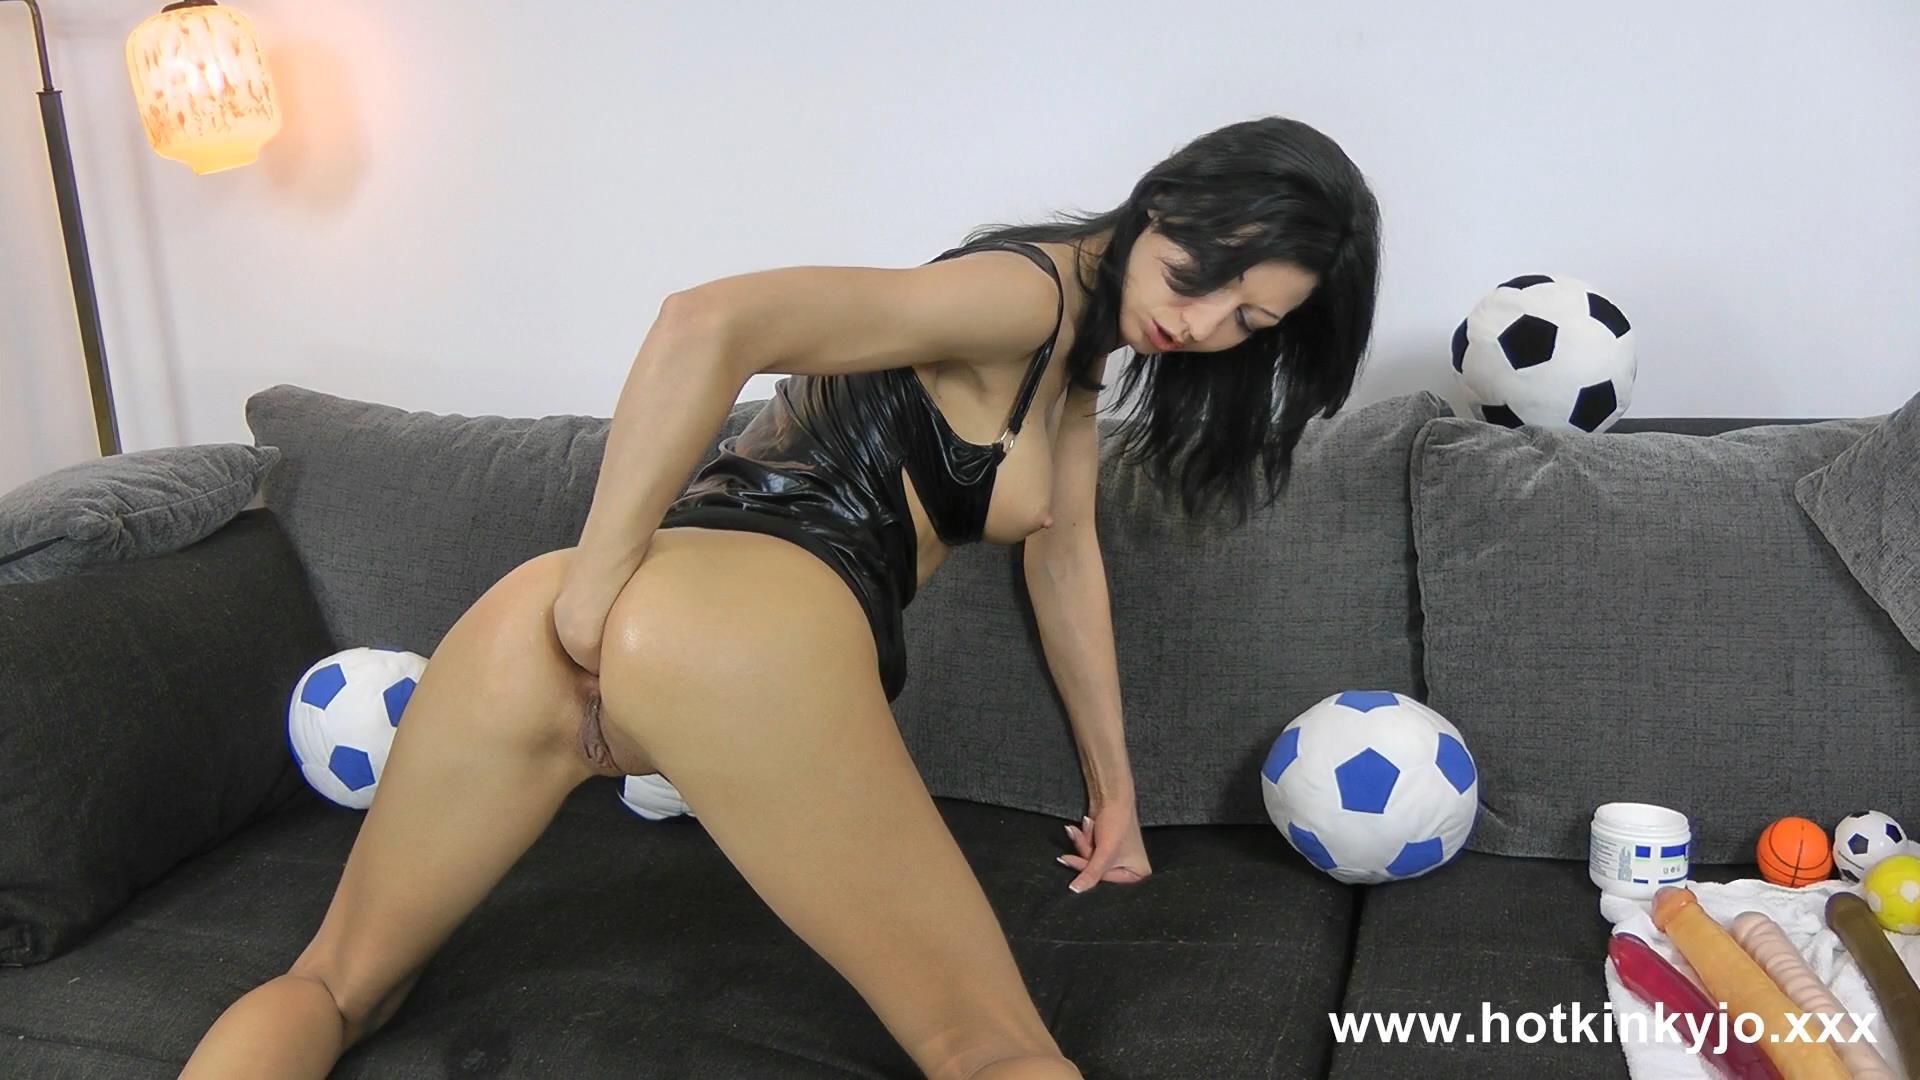 Hotkinkyjo Balls